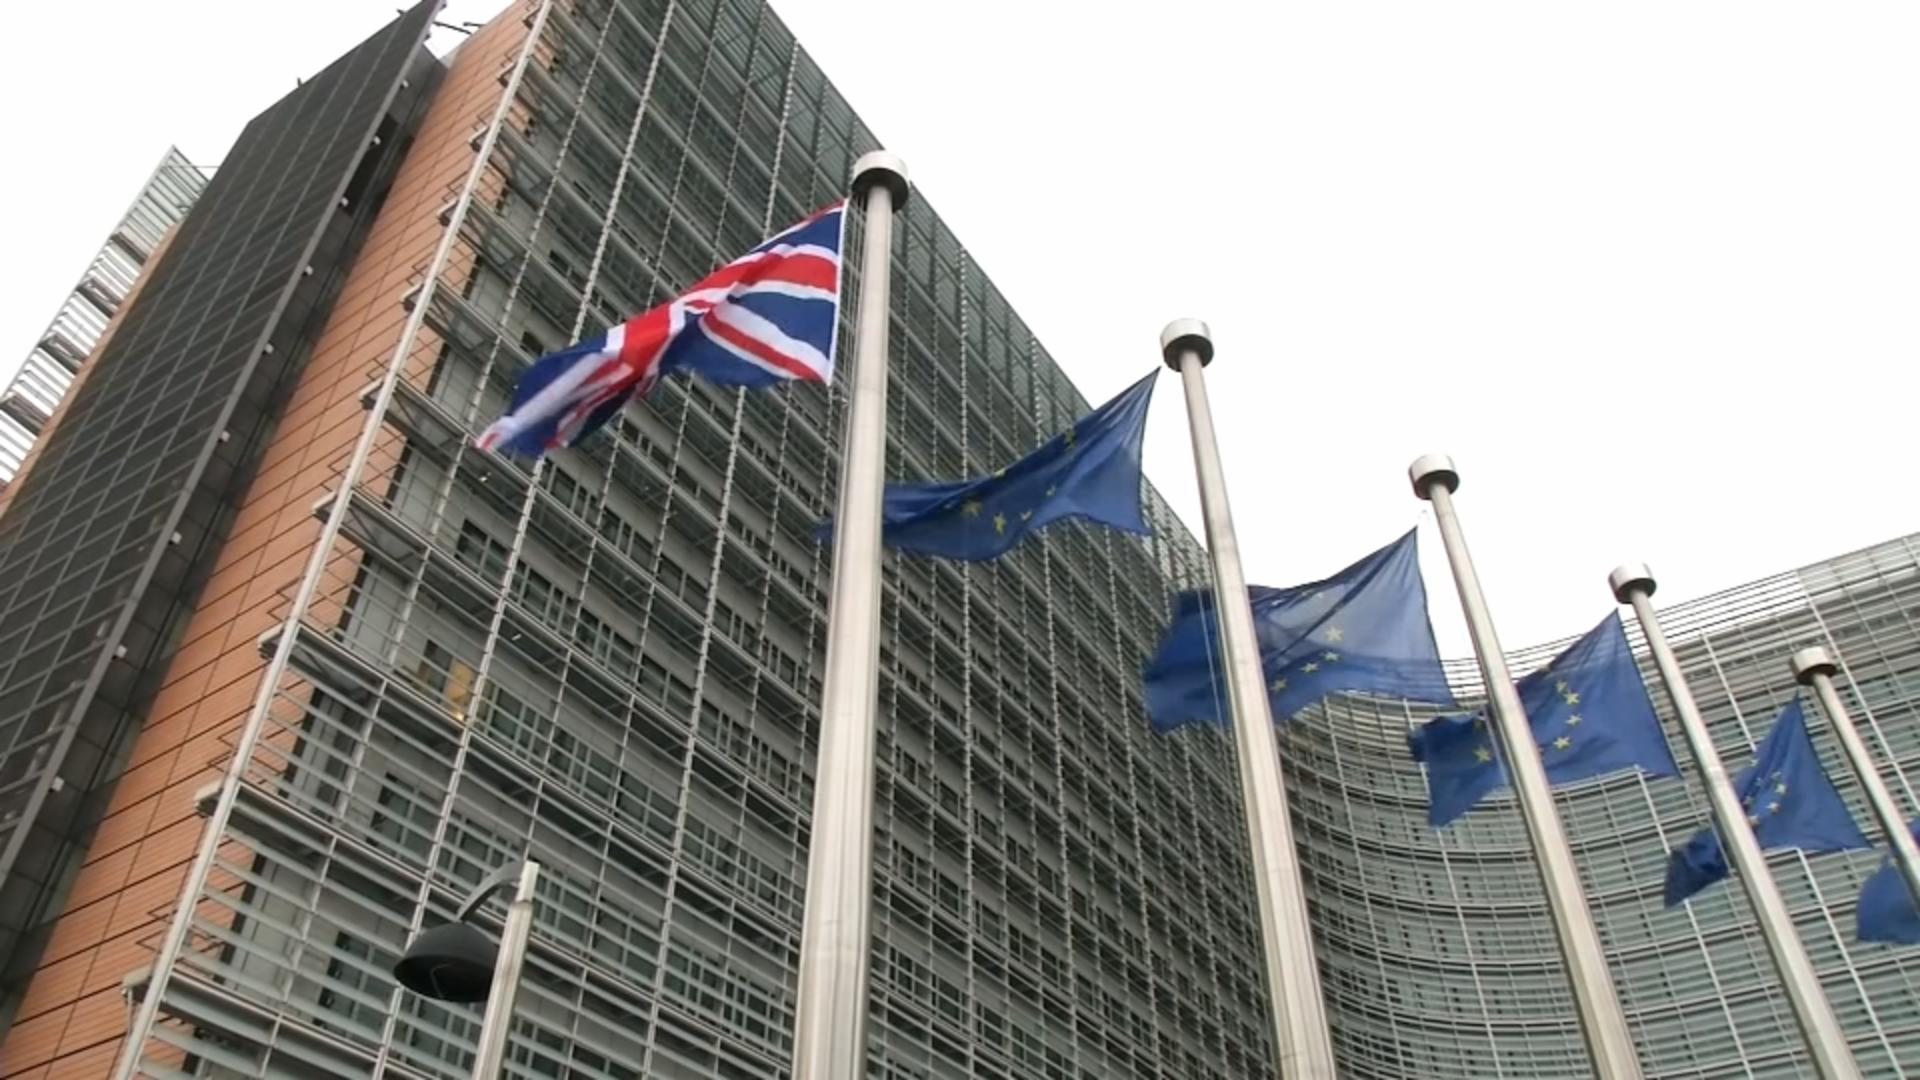 Brexit 'Divorce Bill' Of £36 Billion Rejected By Tory Eurosceptics